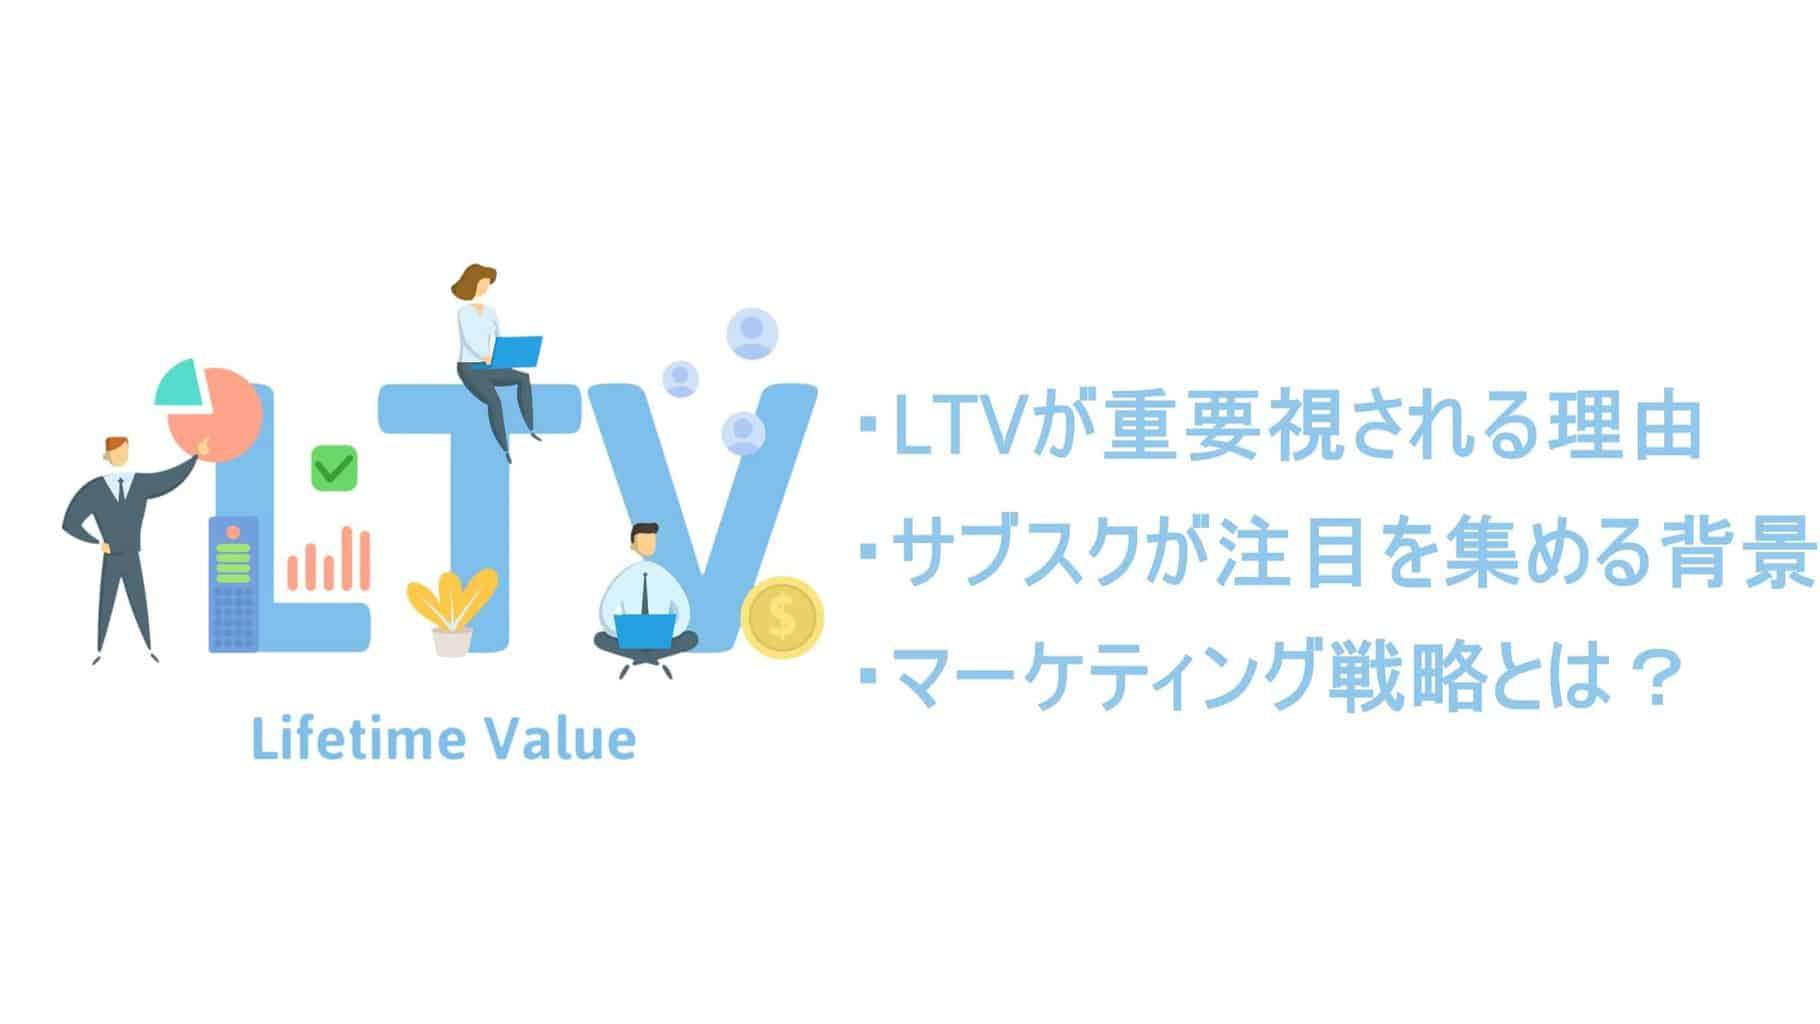 LTVがサブスクビジネスで重要視されている理由とは?LTVを向上させる戦略も紹介!